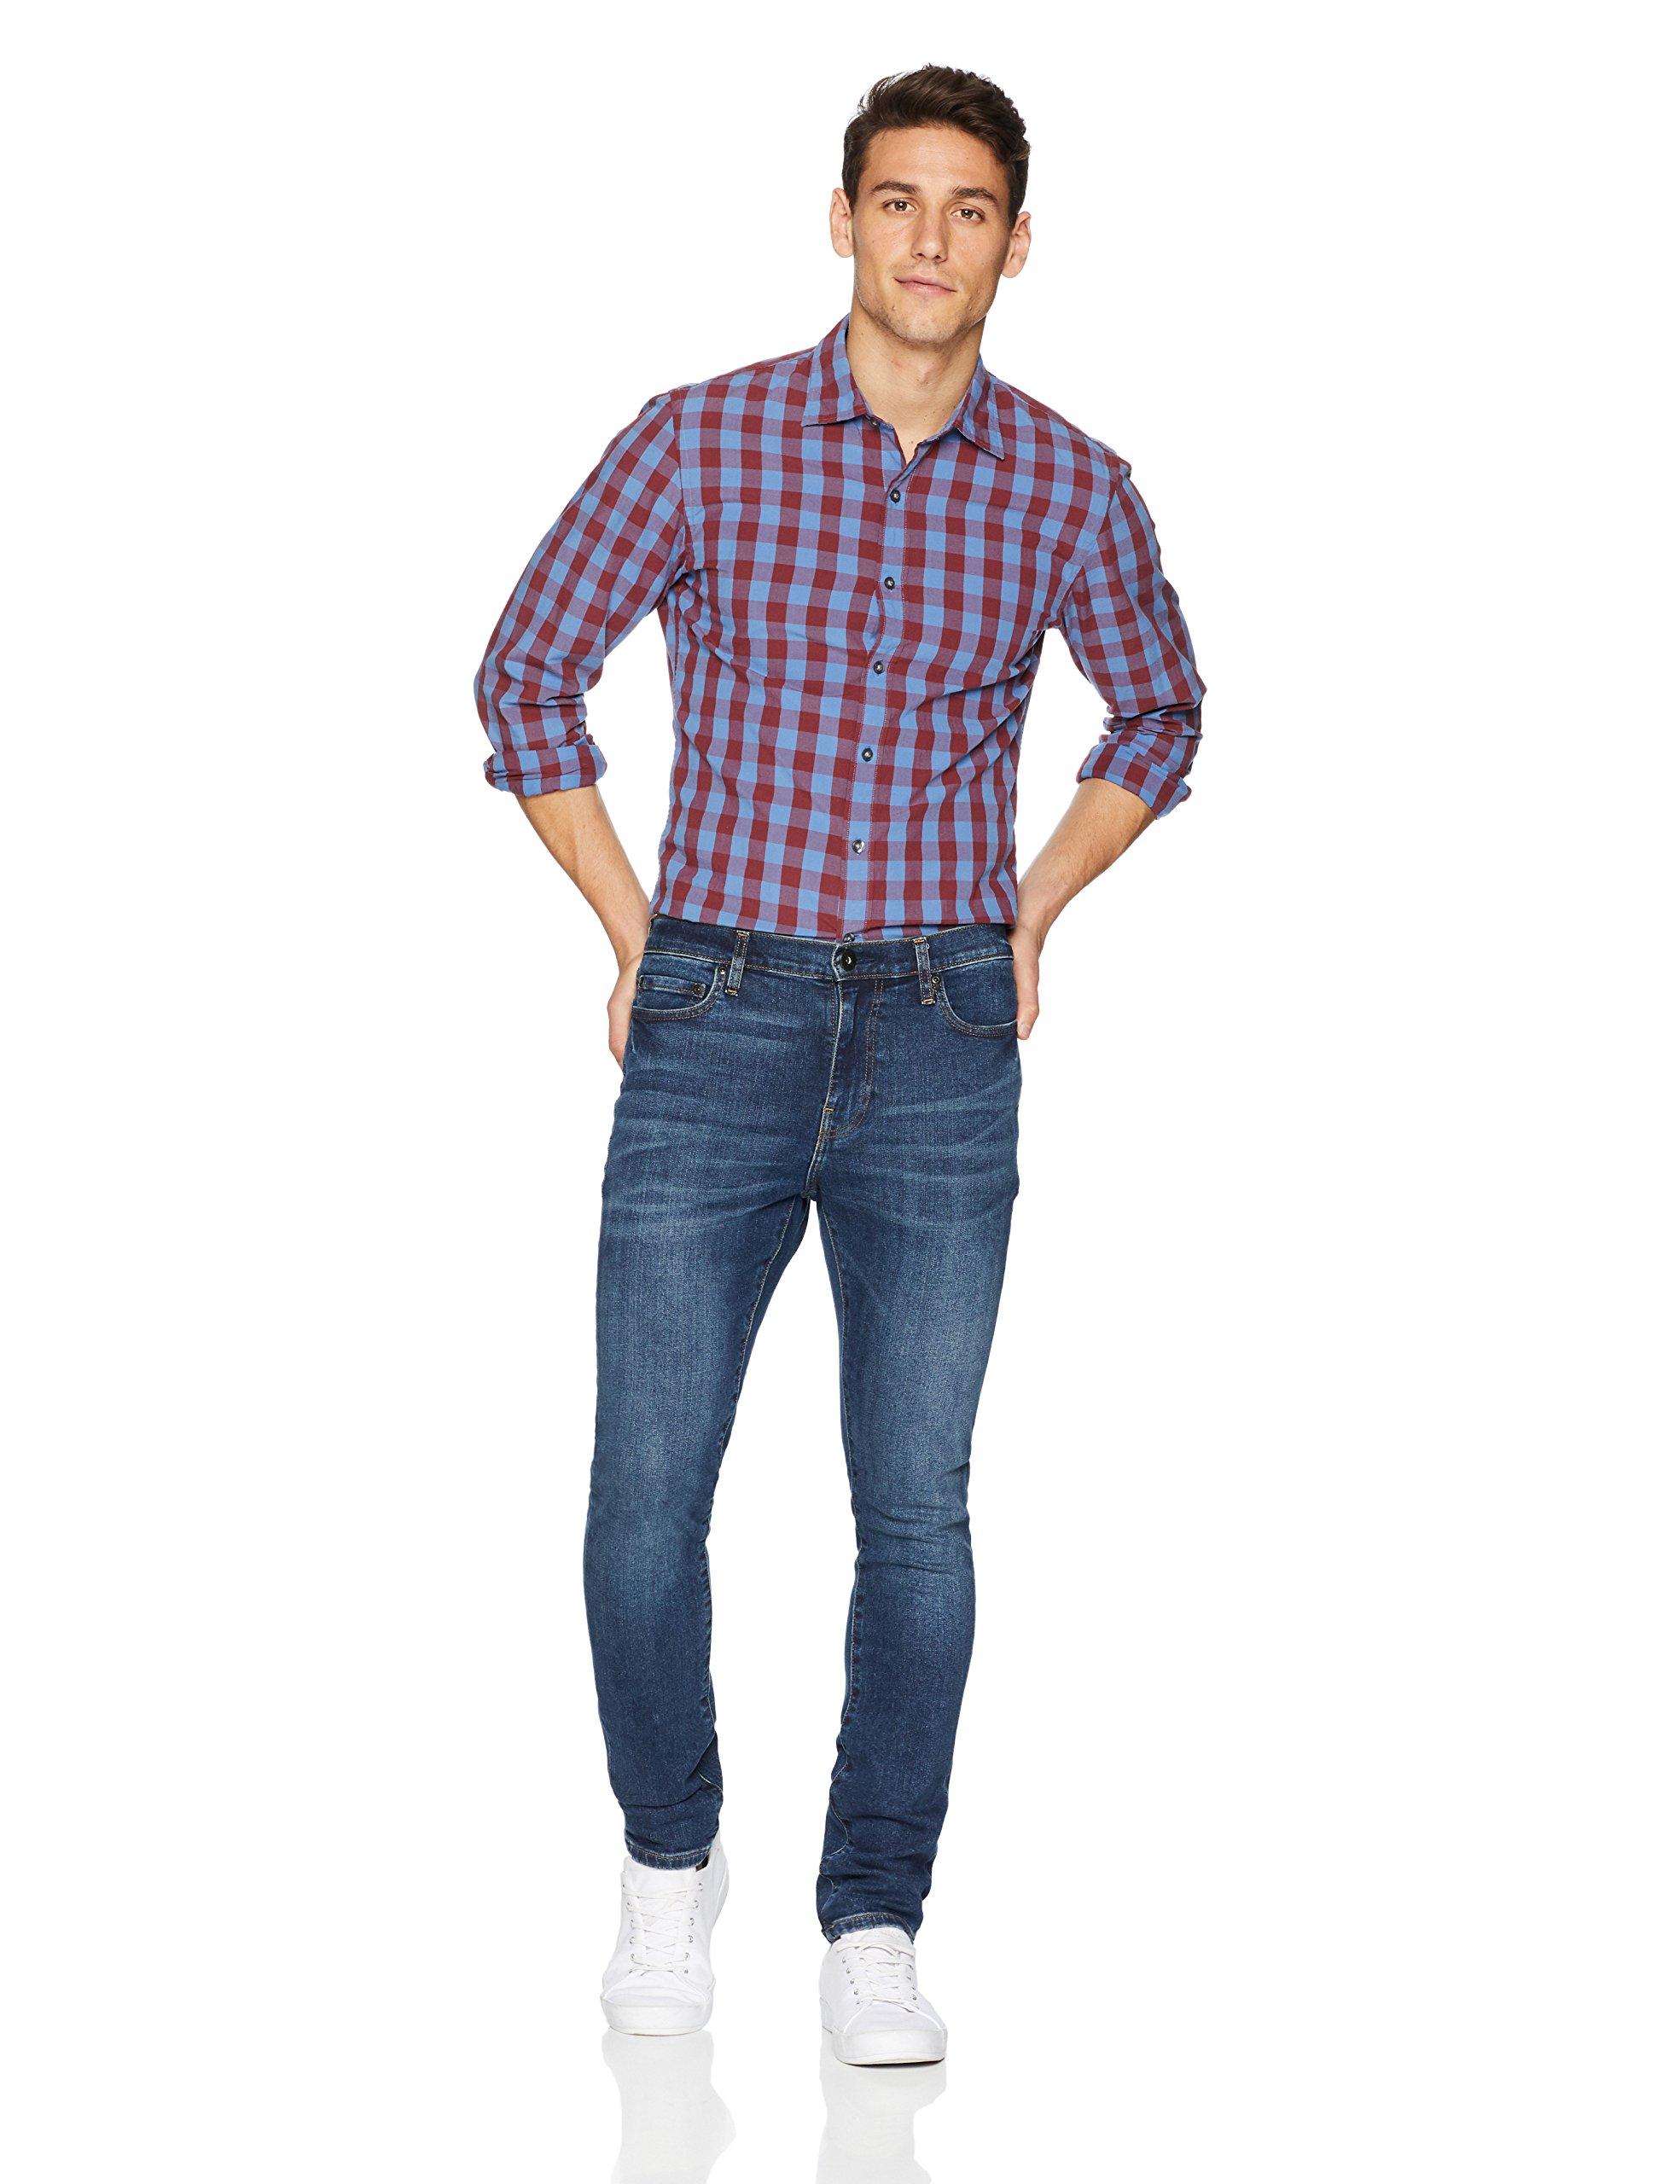 Goodthreads Men's Skinny-Fit Jean, Medium Blue, 38W x 34L by Goodthreads (Image #2)